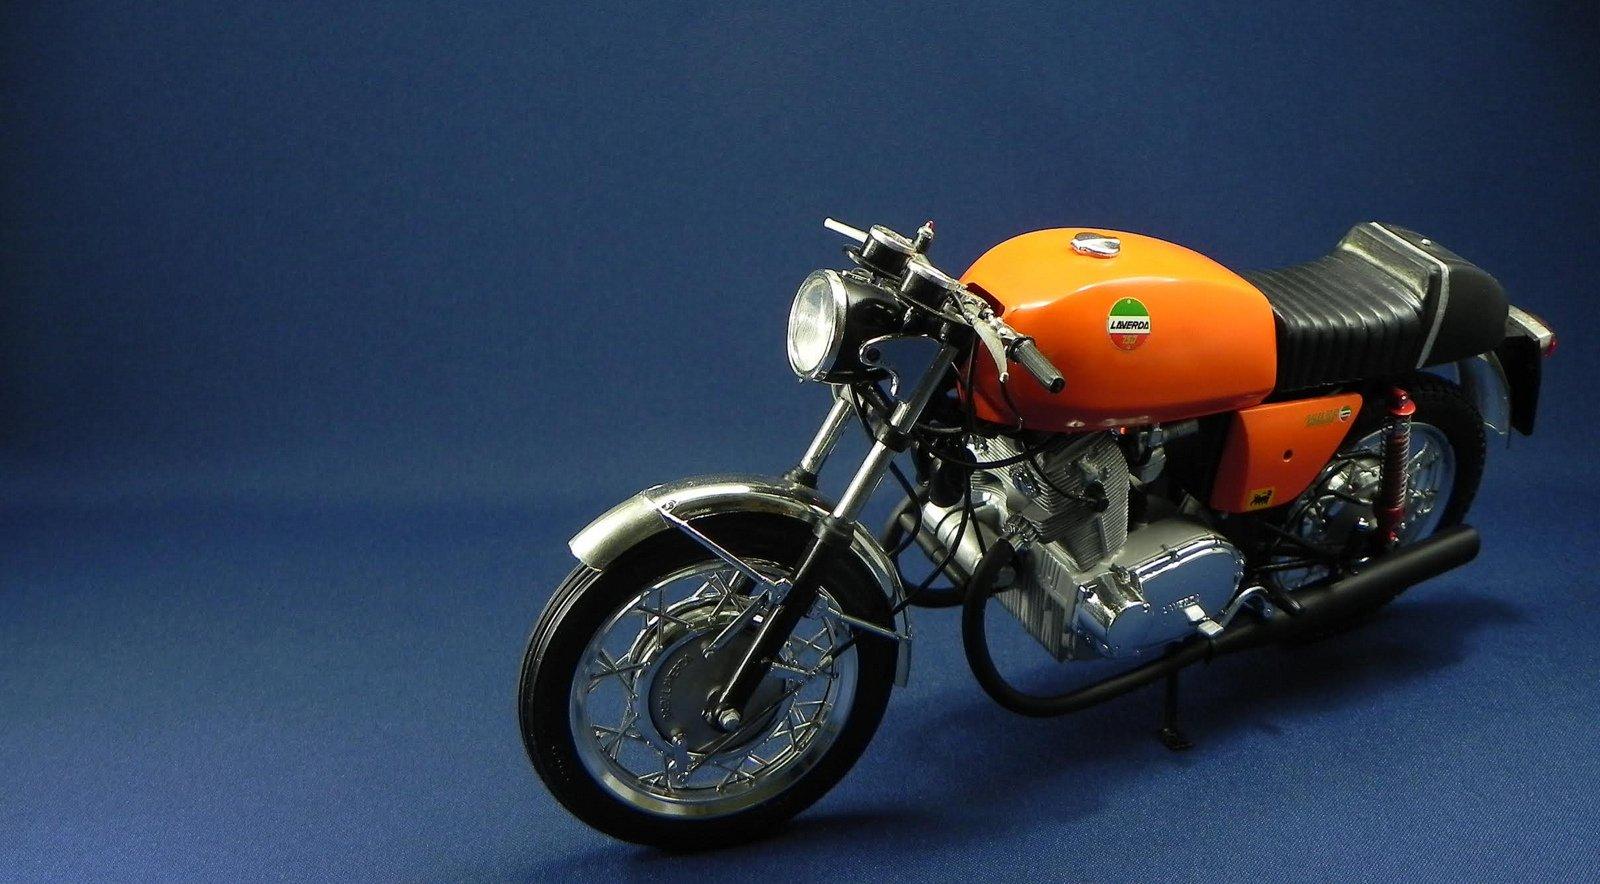 Motorcycle Hobby Scale Modeler